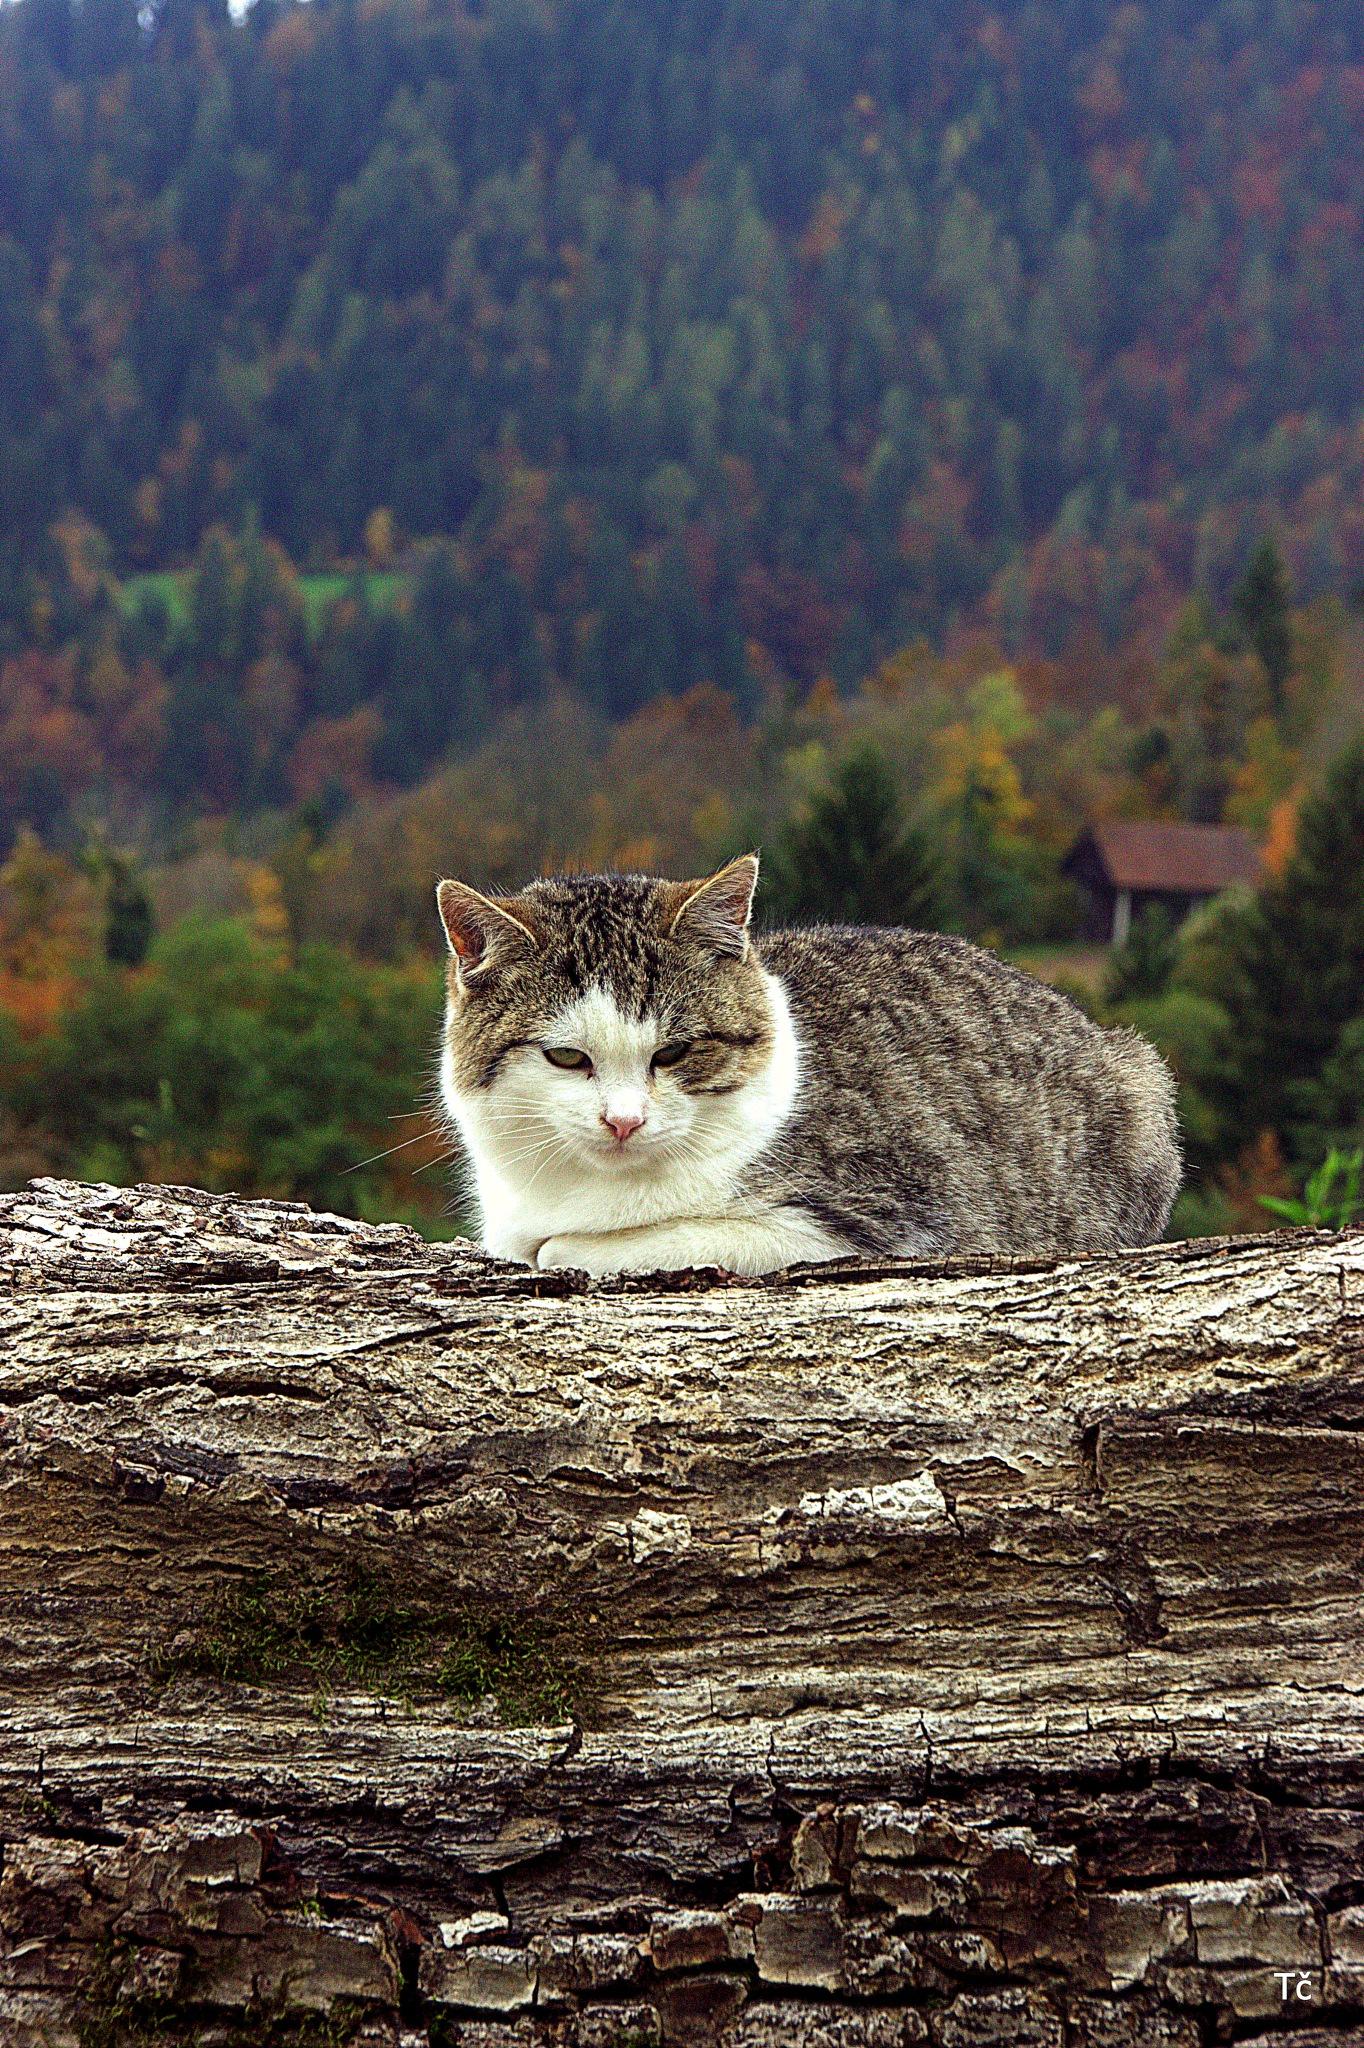 Cat enjoying the autumn scenery by leopold.brzin